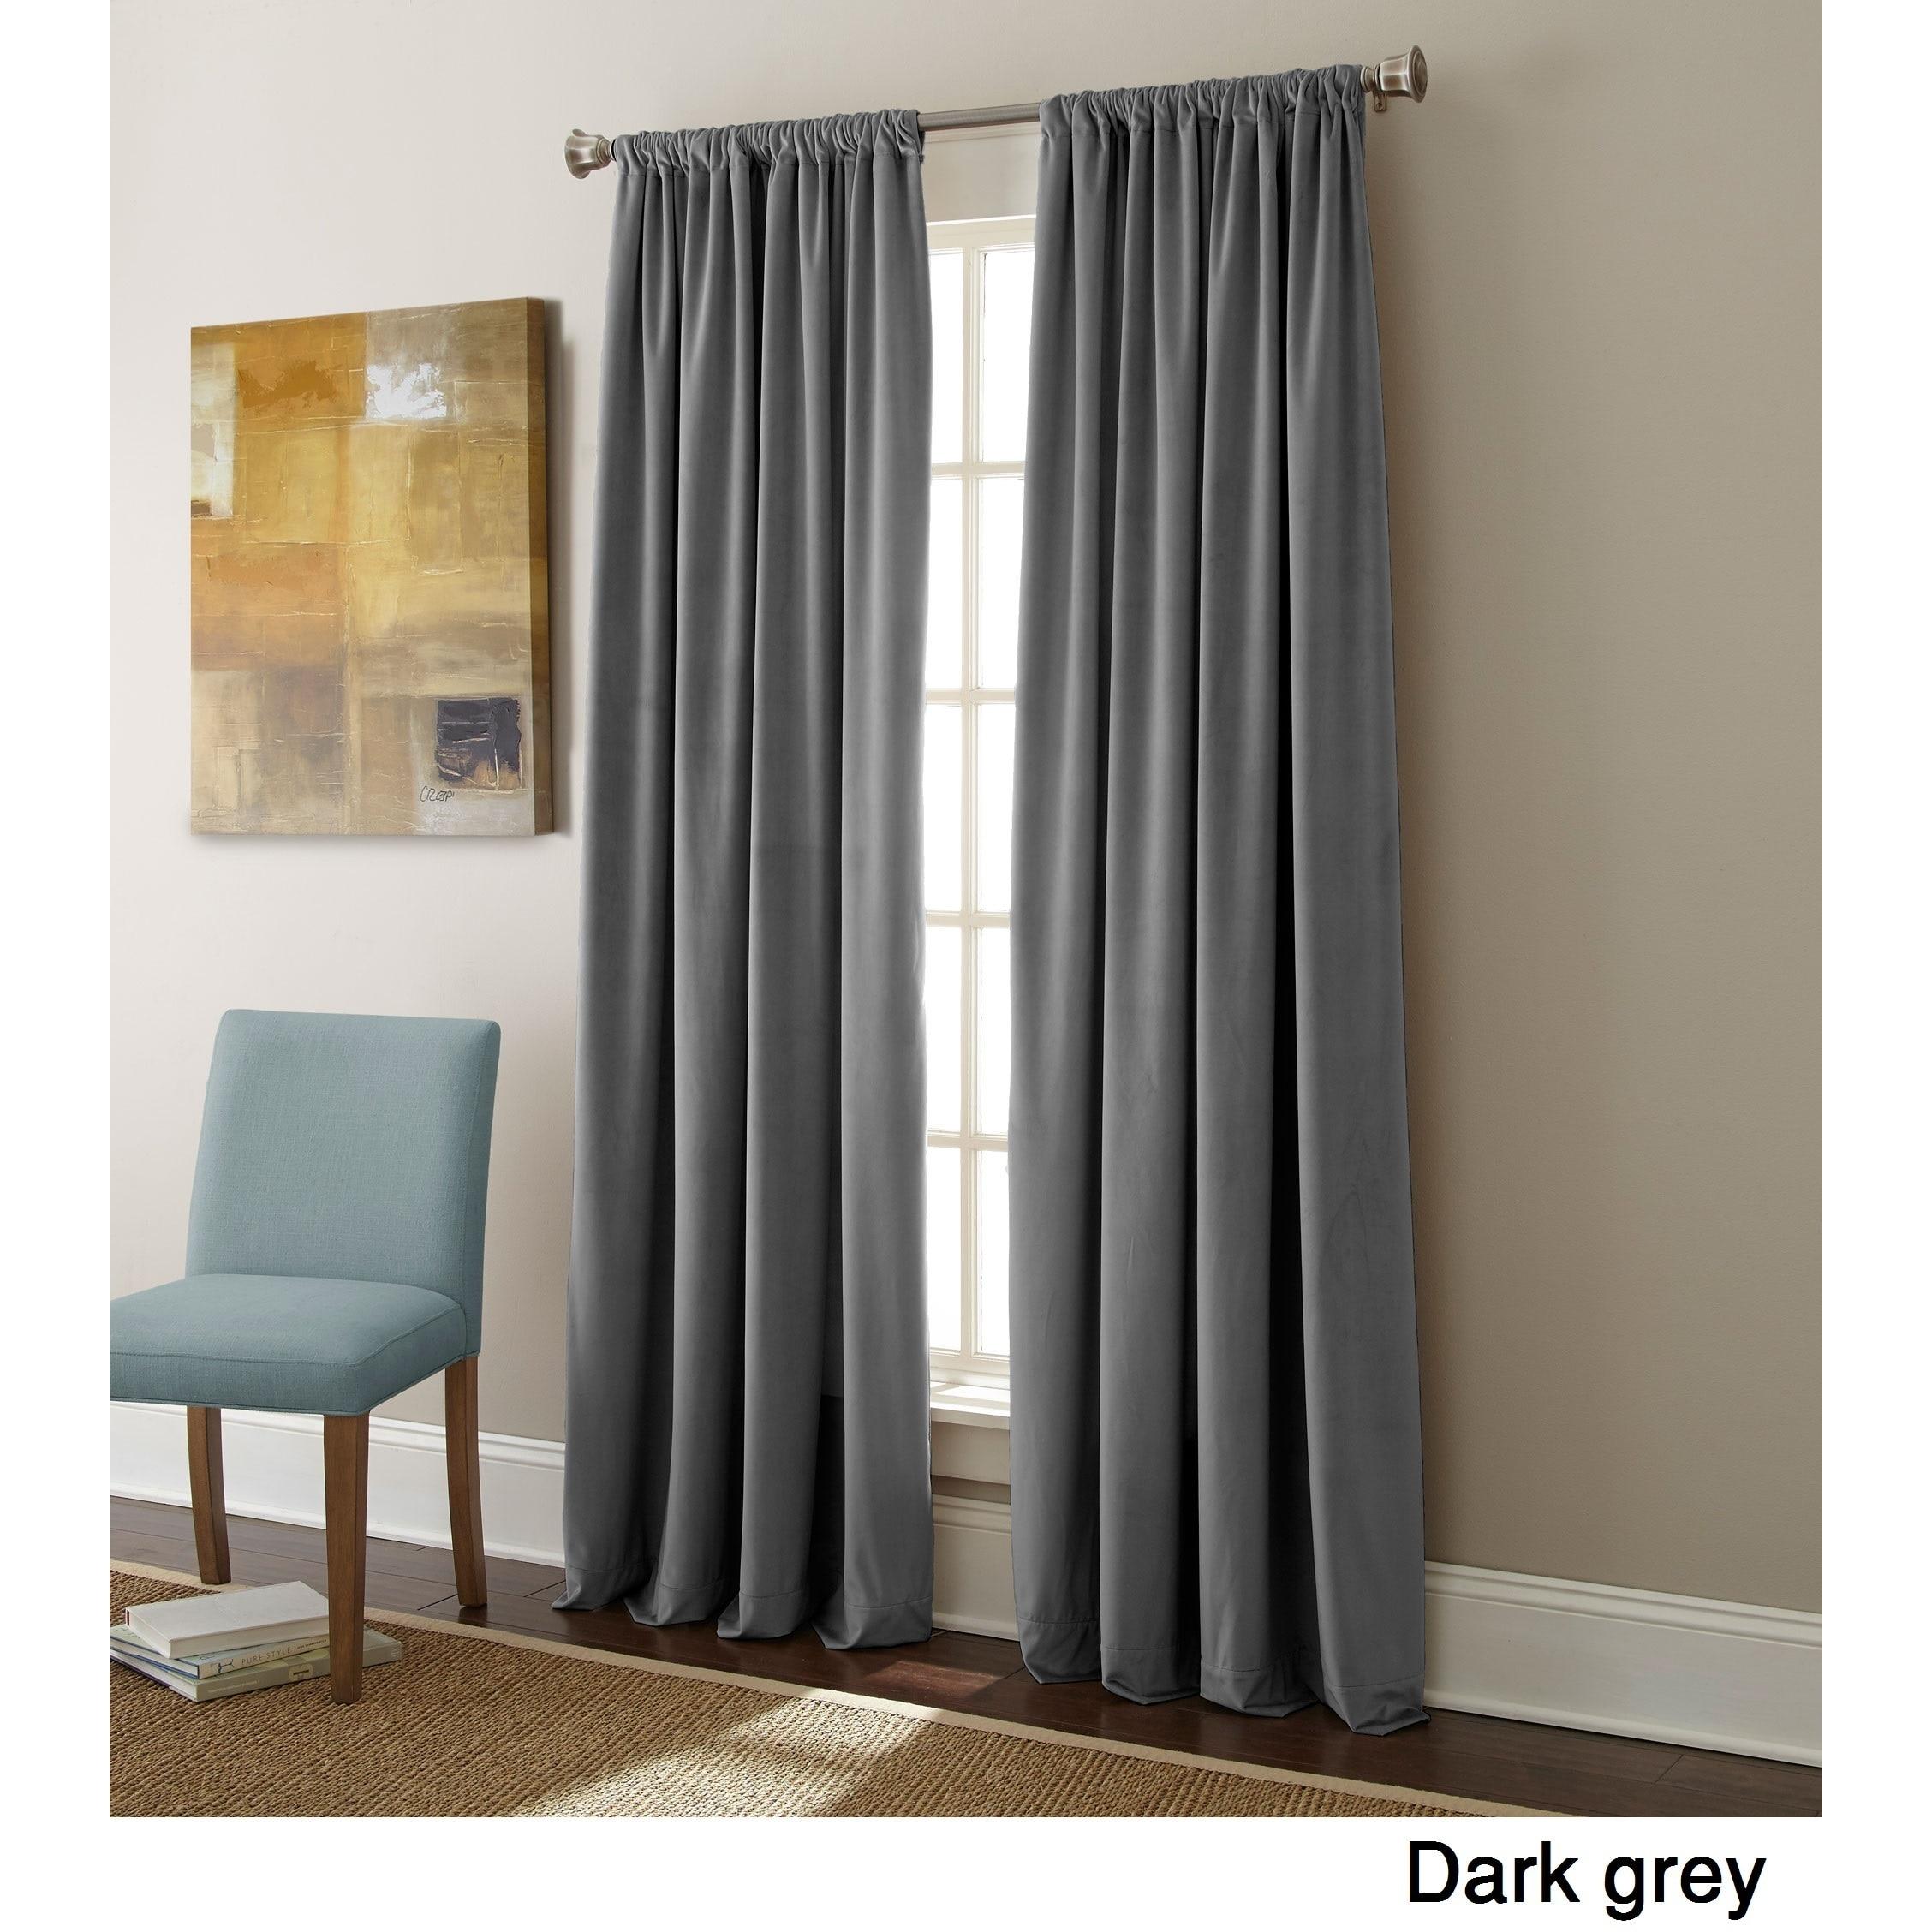 Shop Sherry Kline Elite Velvet 84-inch Curtain Panel Pair - N/A ...